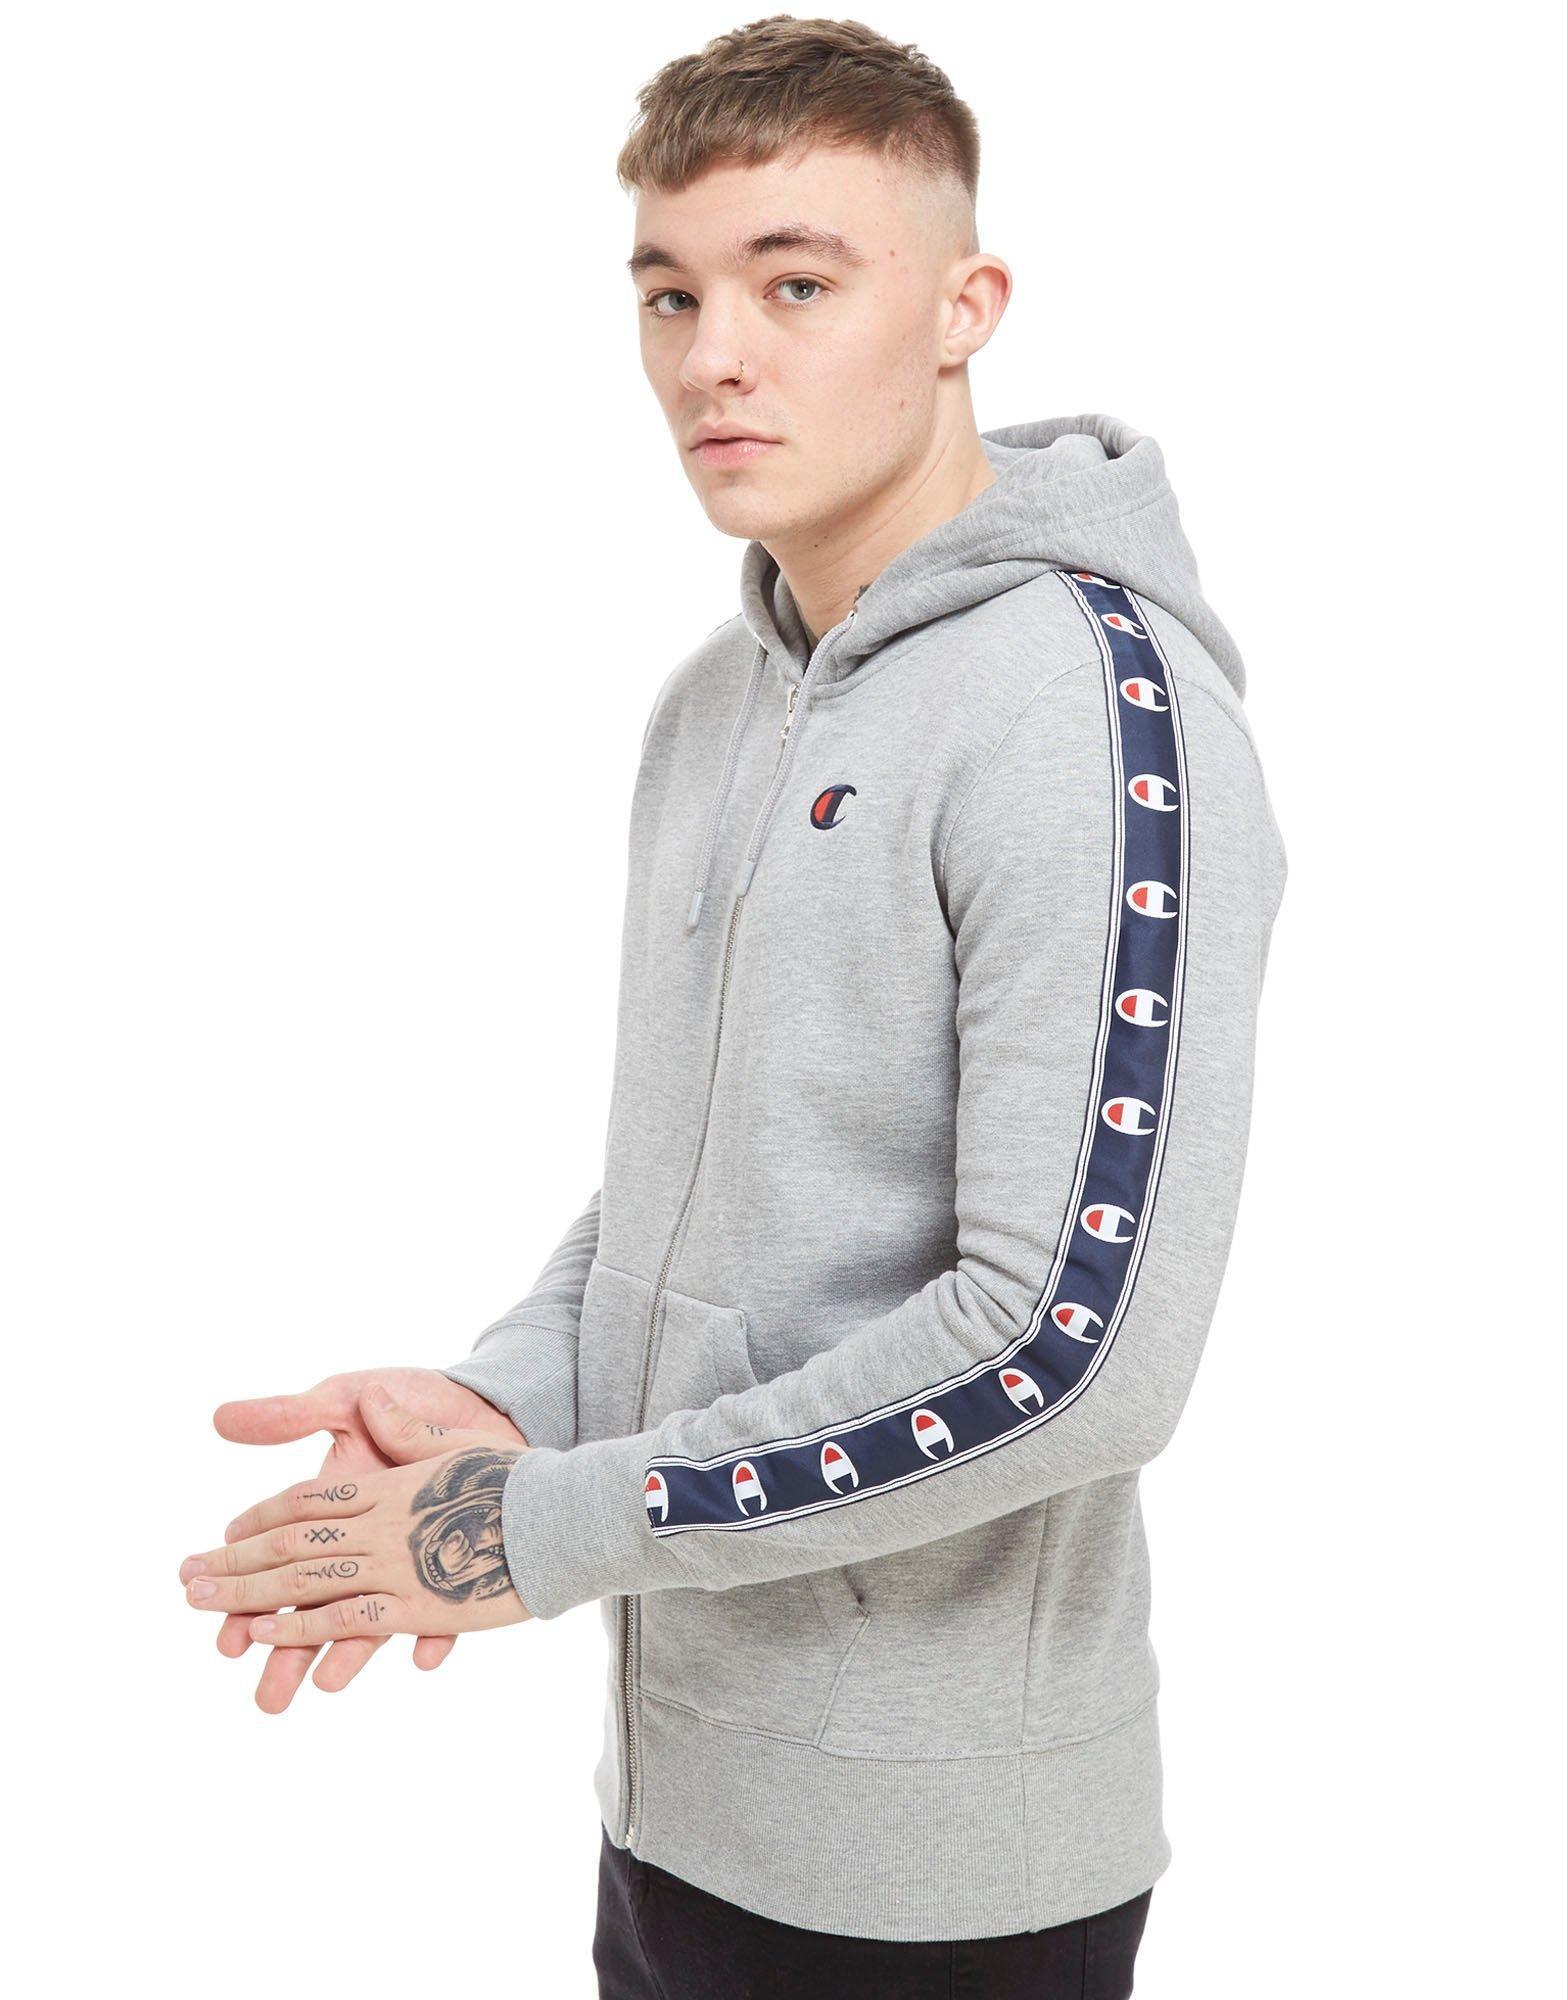 558da986 Champion Full Zip Hooded Sweatshirt - DREAMWORKS